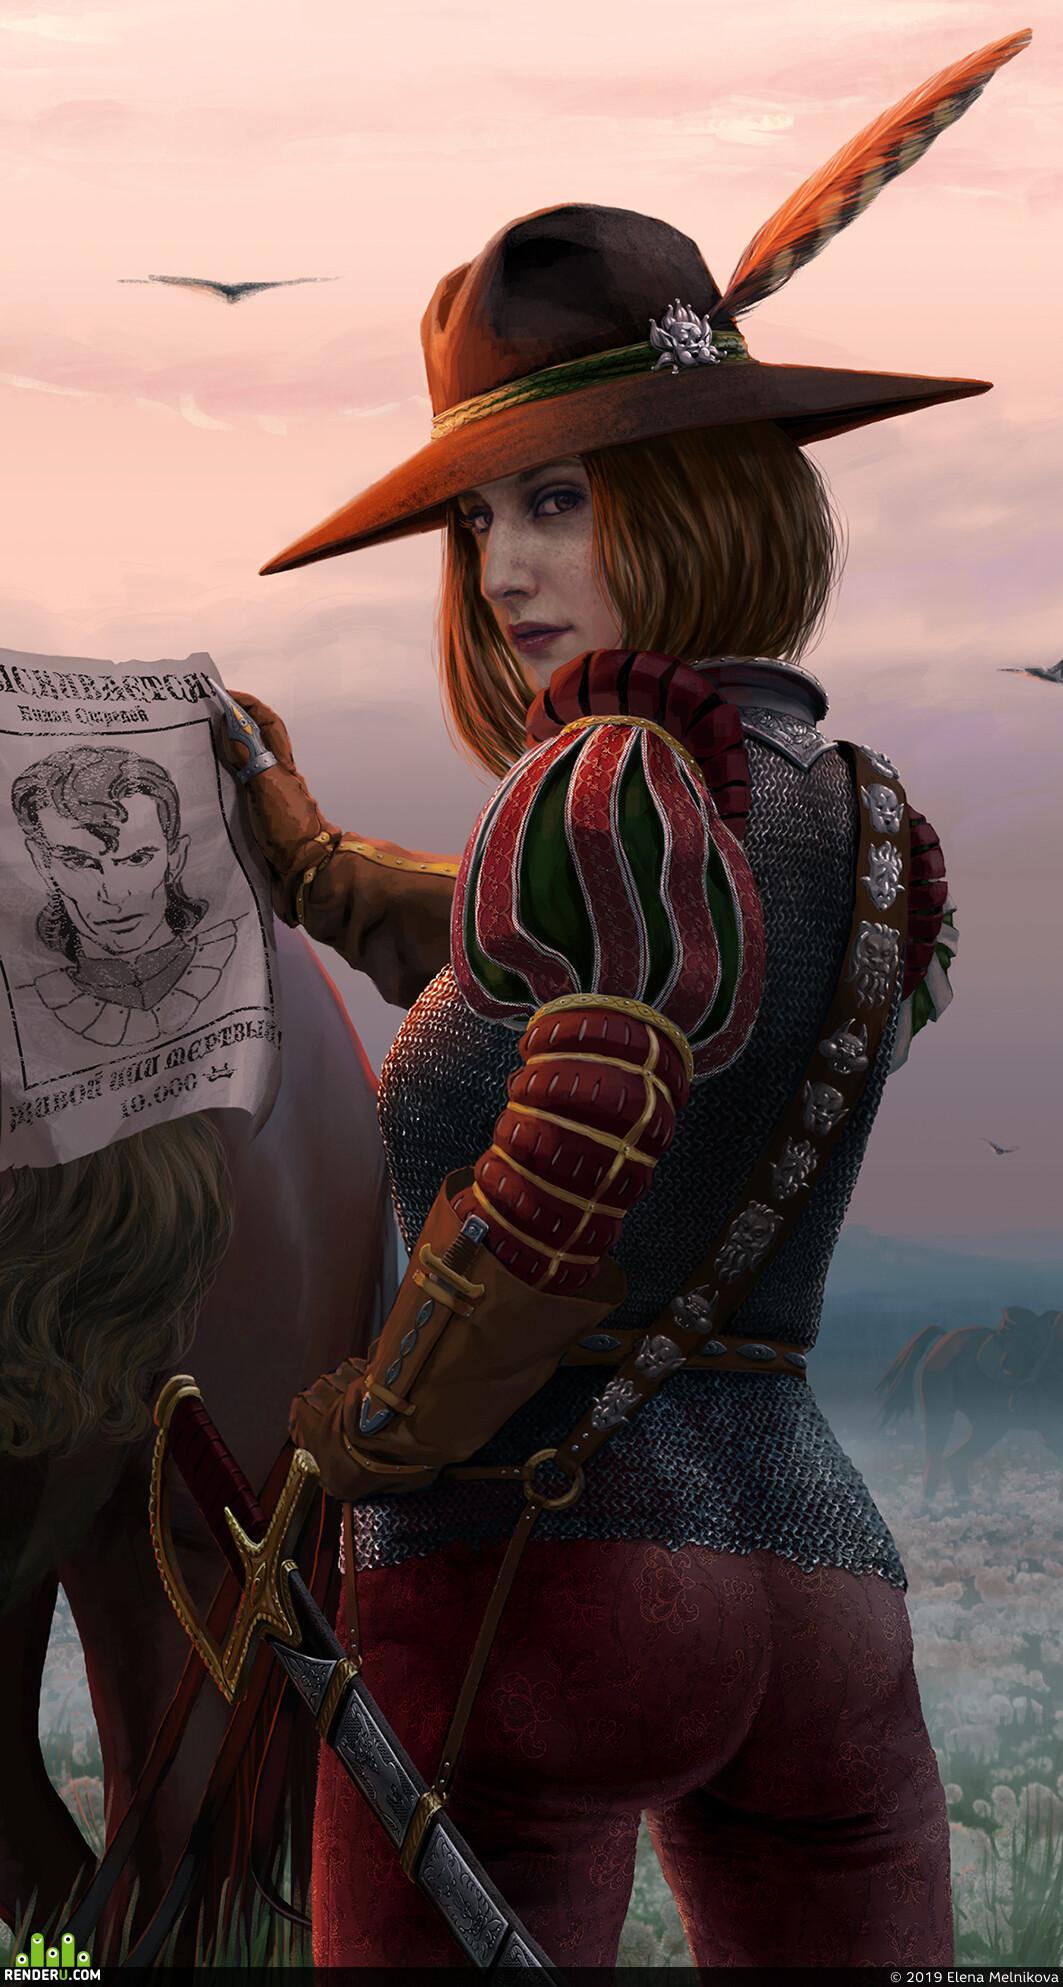 bountyhunter, captive, Characters, cowboyhat, dandelions, dawn, Fantasy, gameart, horse, feael